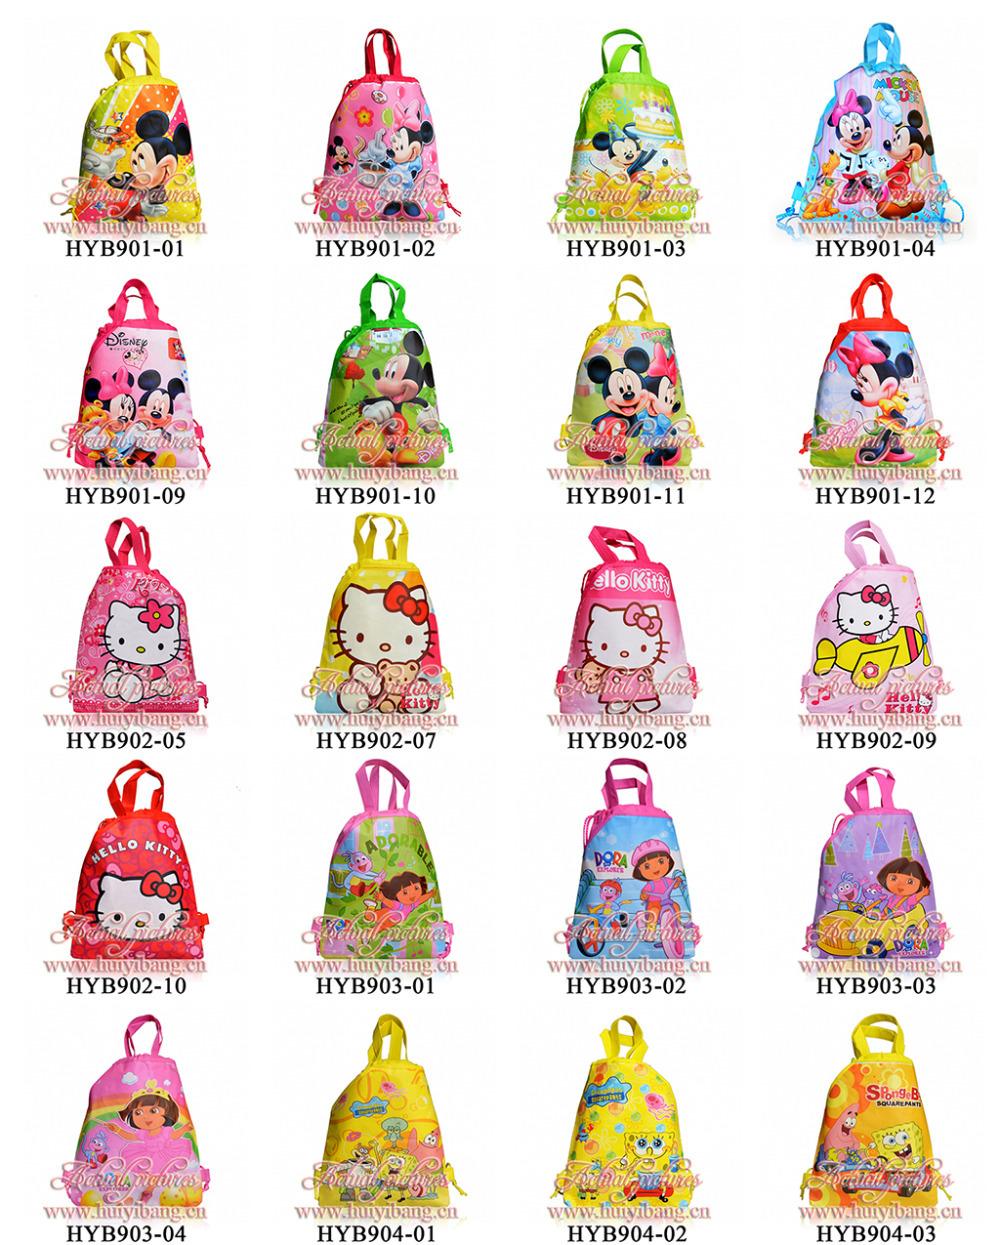 Free DHL-150Pcs Mickey ,Dora,Diego,Cars ,Princess ,Spider Man,Kitty Children Drawstring Backpack School Bags,Kids Totes,34*27cm(China (Mainland))